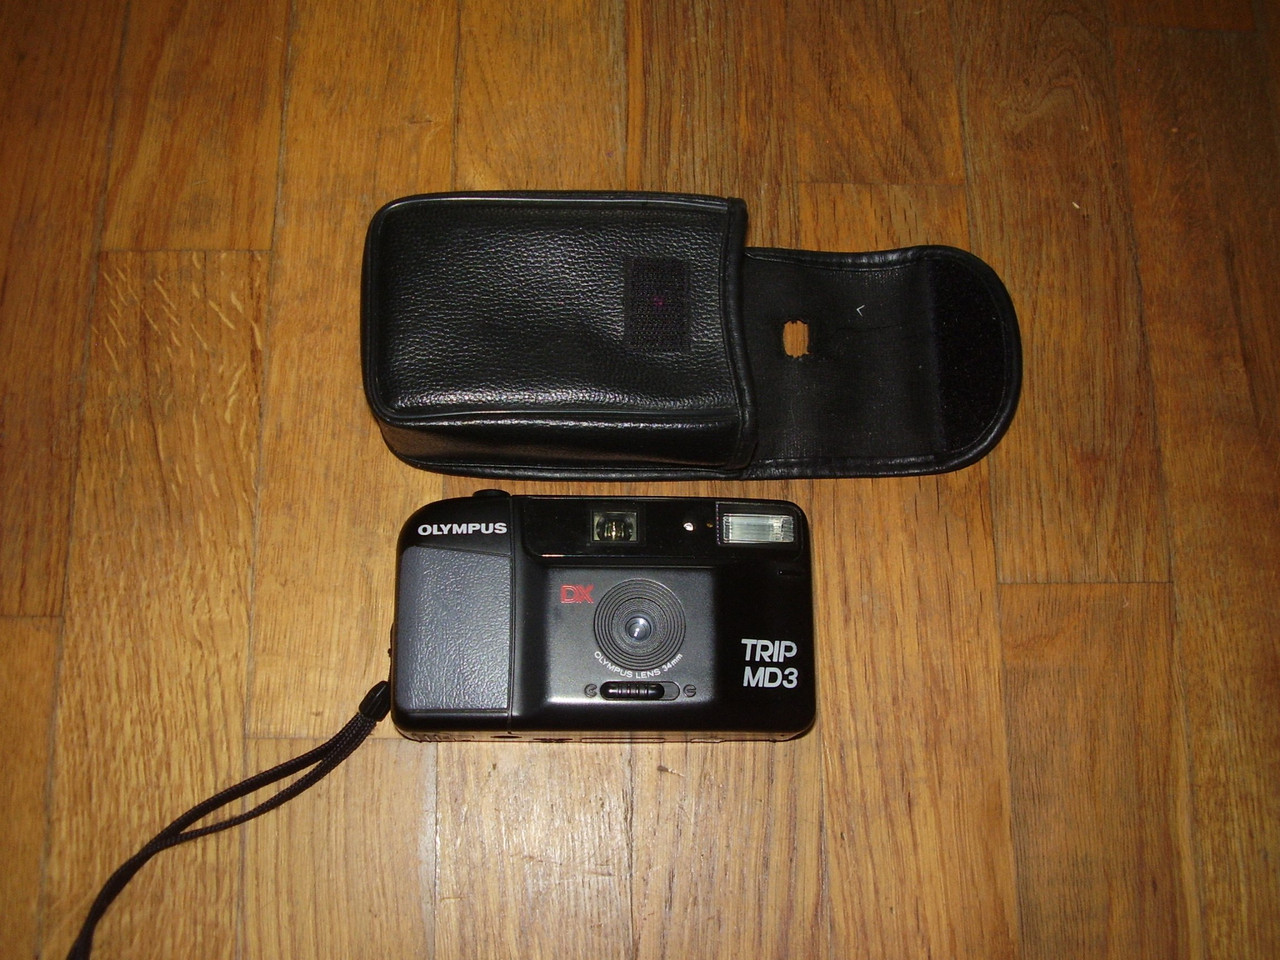 Фотоаппарат Olympus TripMD3